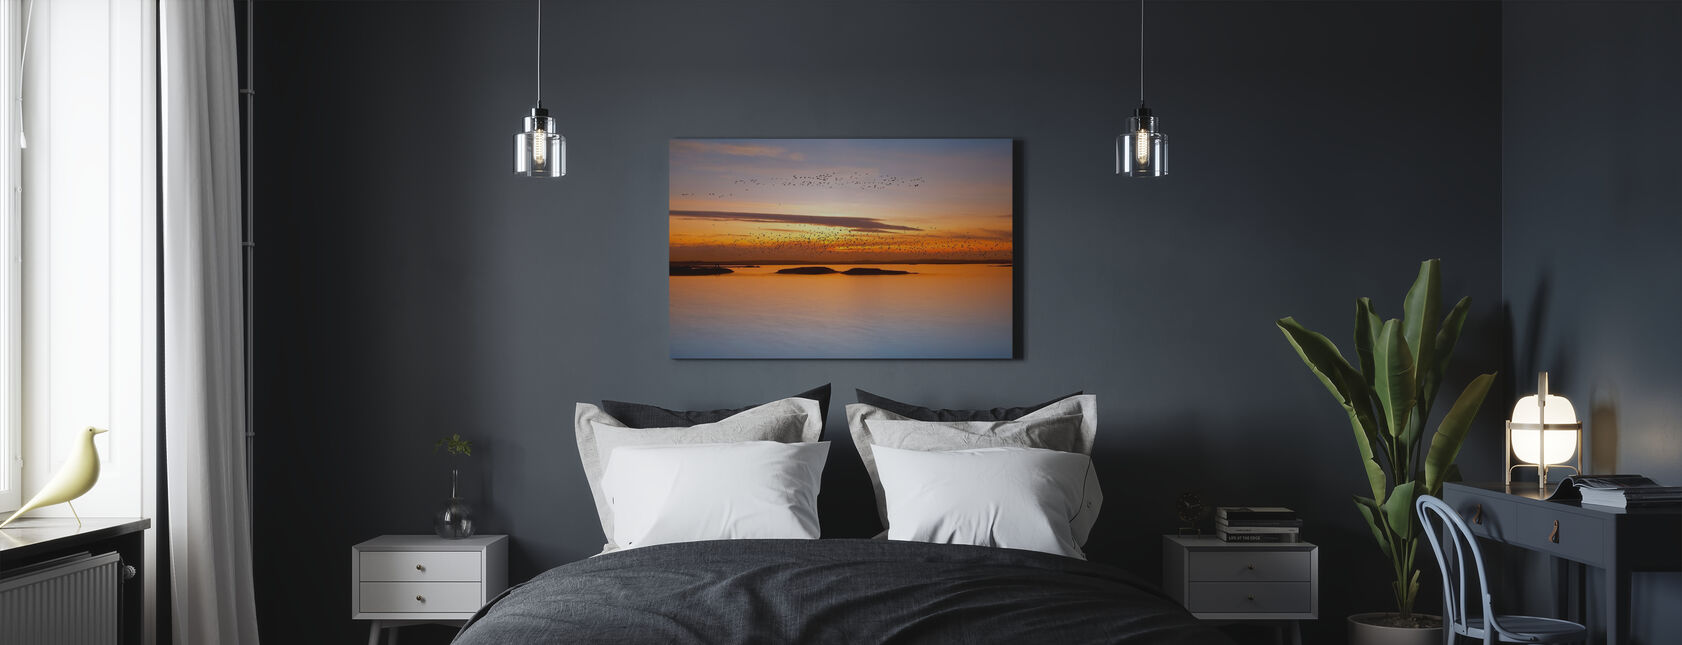 Sonnenuntergang - Leinwandbild - Schlafzimmer